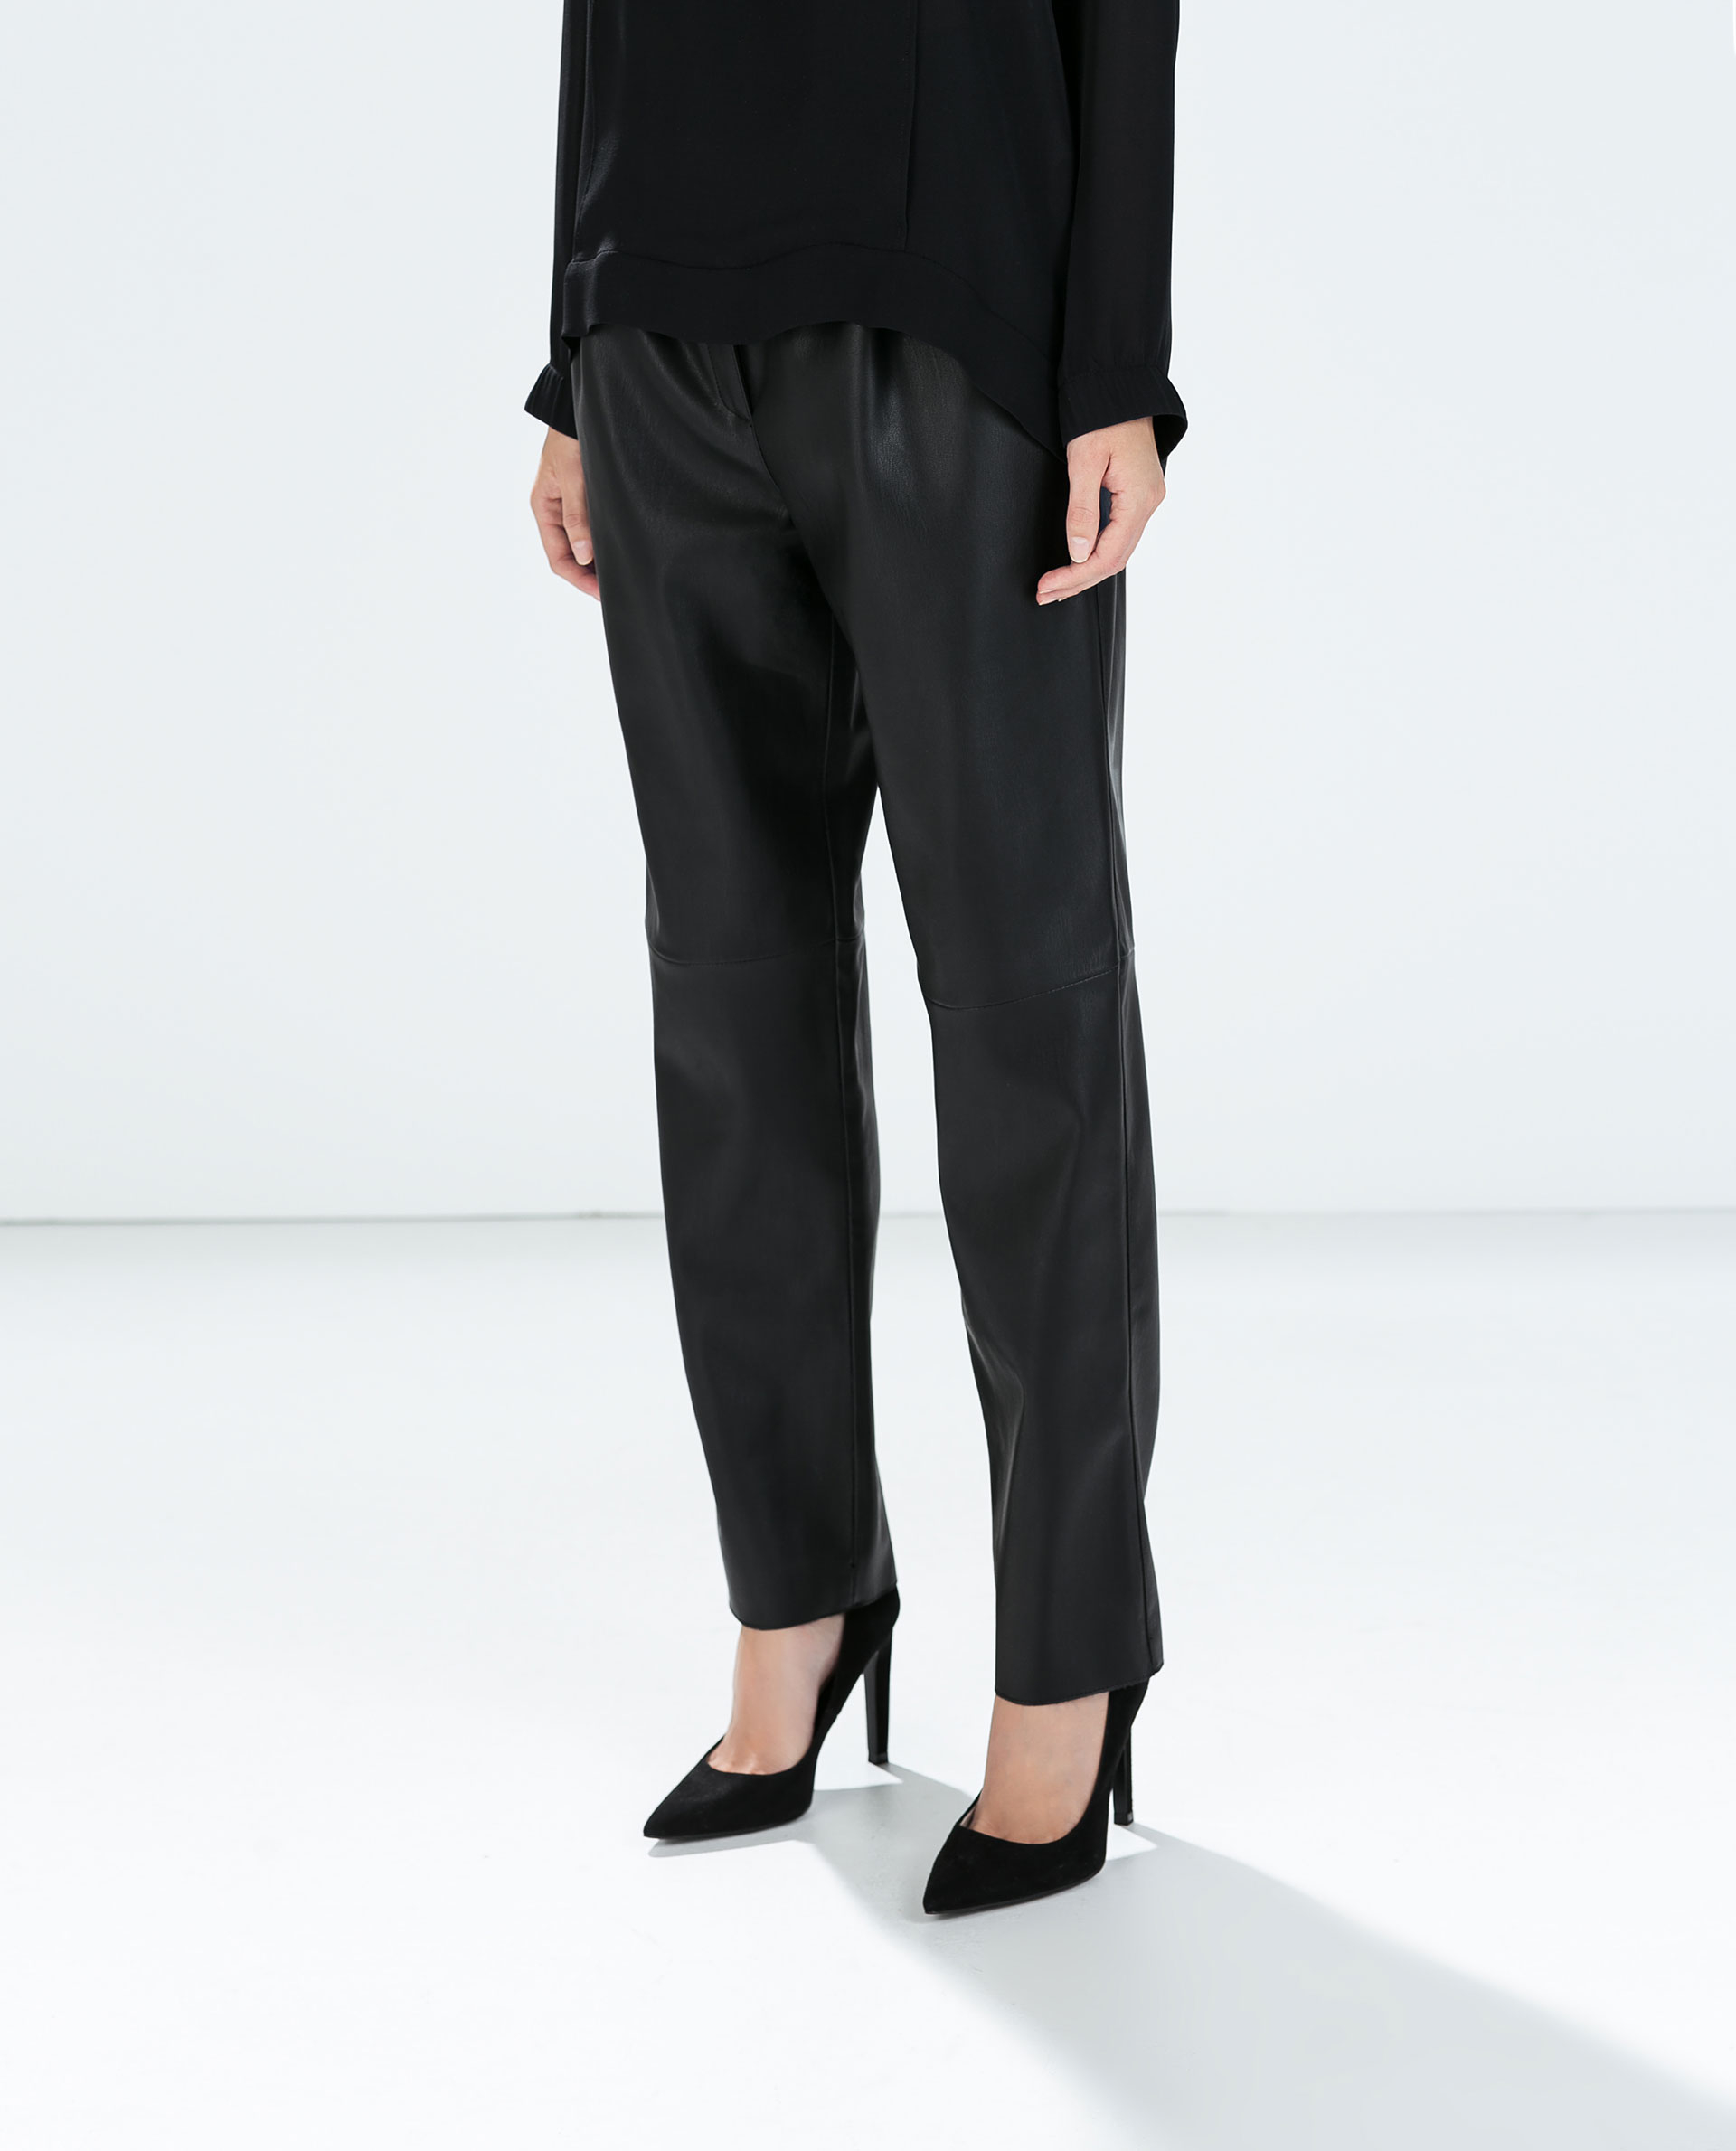 Cool Women39s Faux Leather Pants Women39s Black Leather Pants